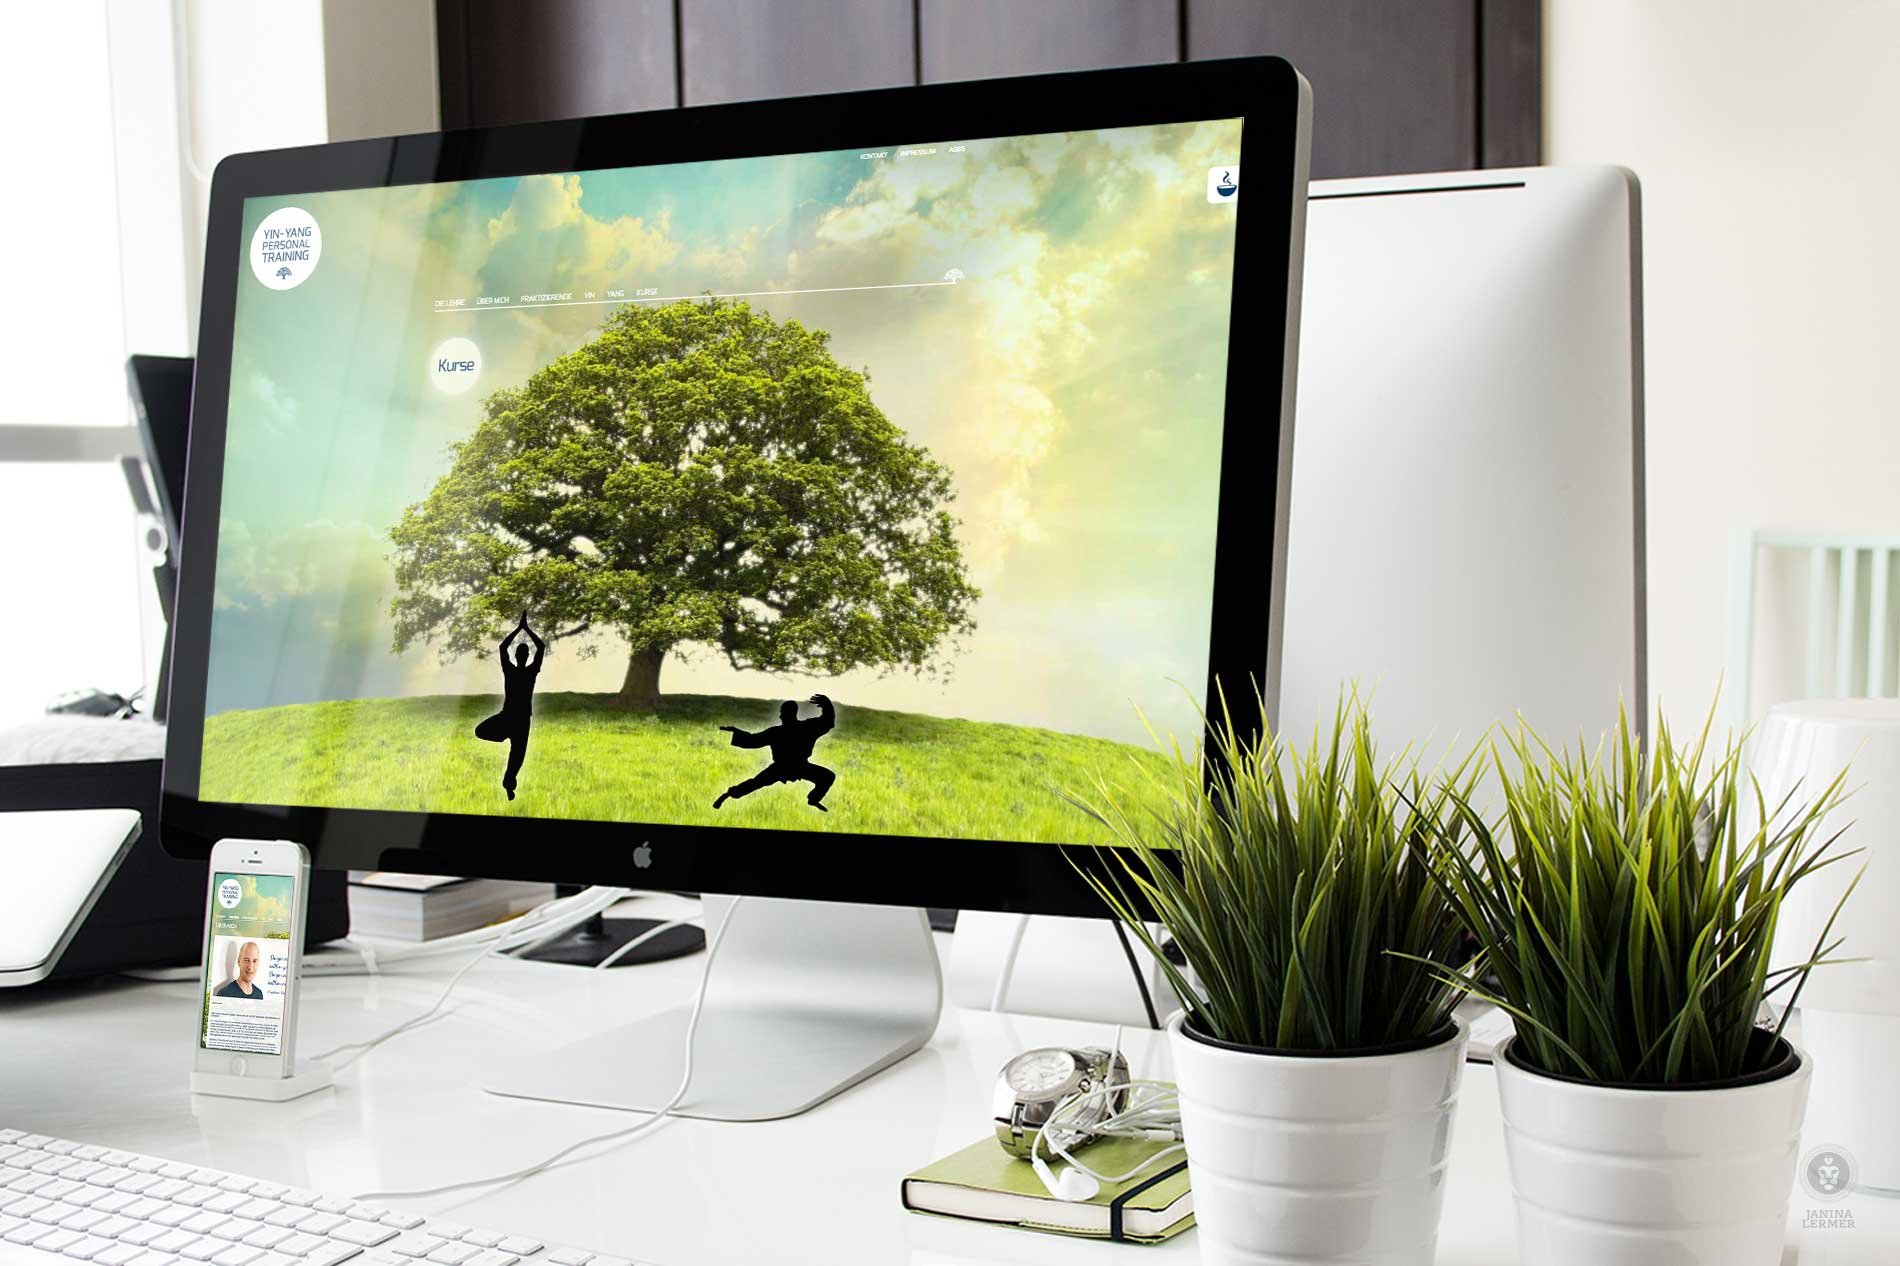 Webseitenkonzept-Webseitengestaltung-Webdesign-Yin-Yang-PersonalTrainer-Ulrich-Lampert-Home-Fruehling